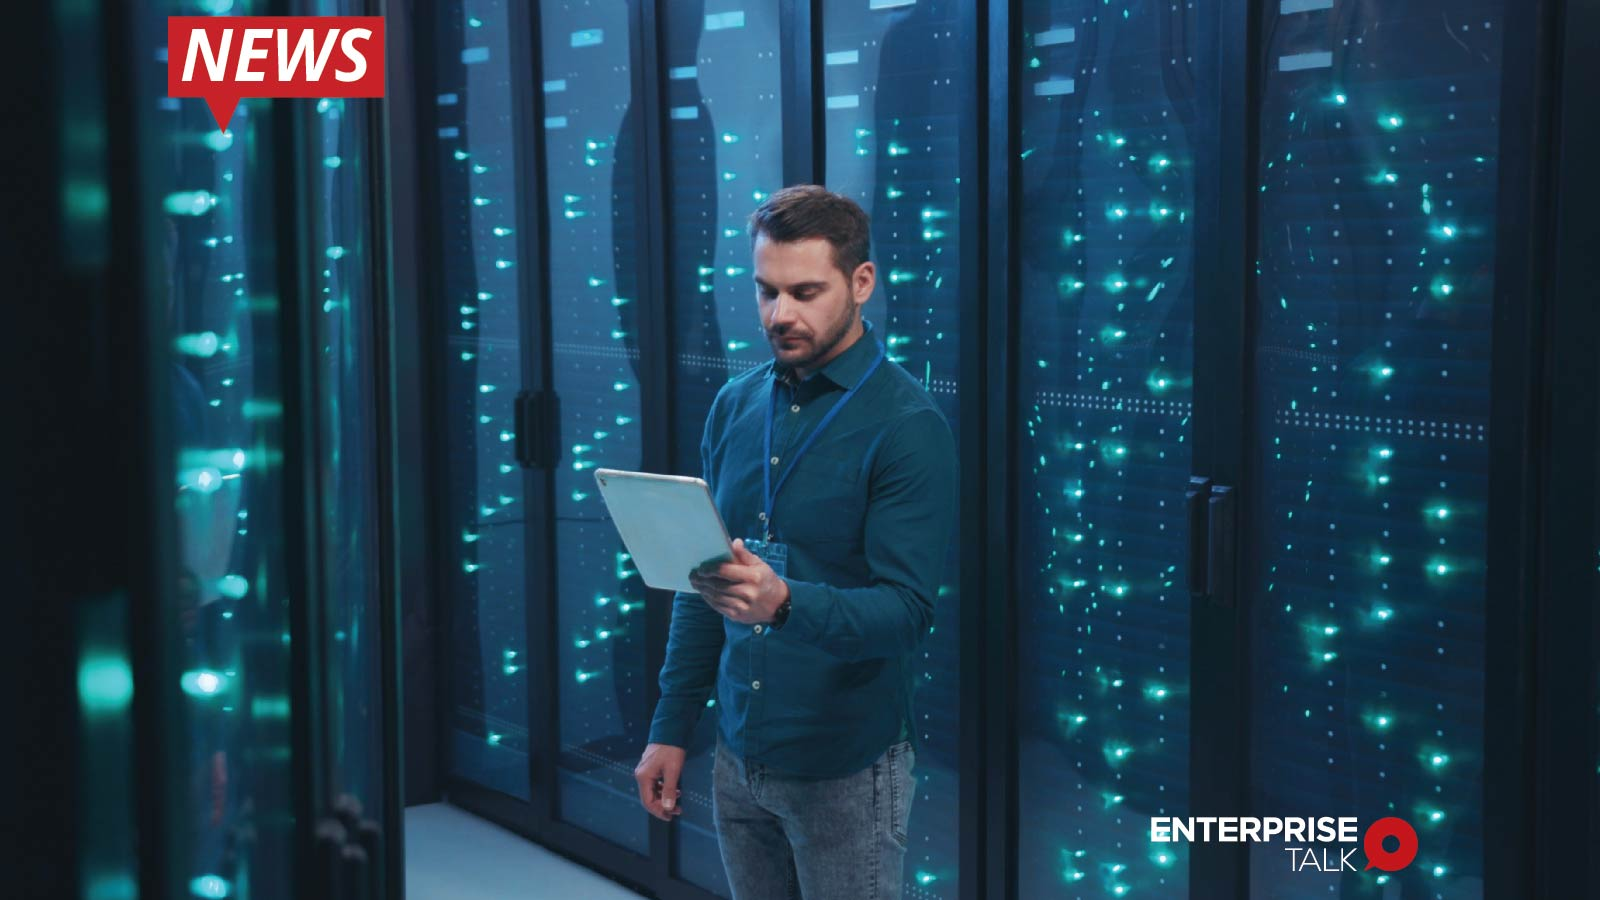 Vantage Data Centers Acquires Hypertec's Hyperscale Data Center Business